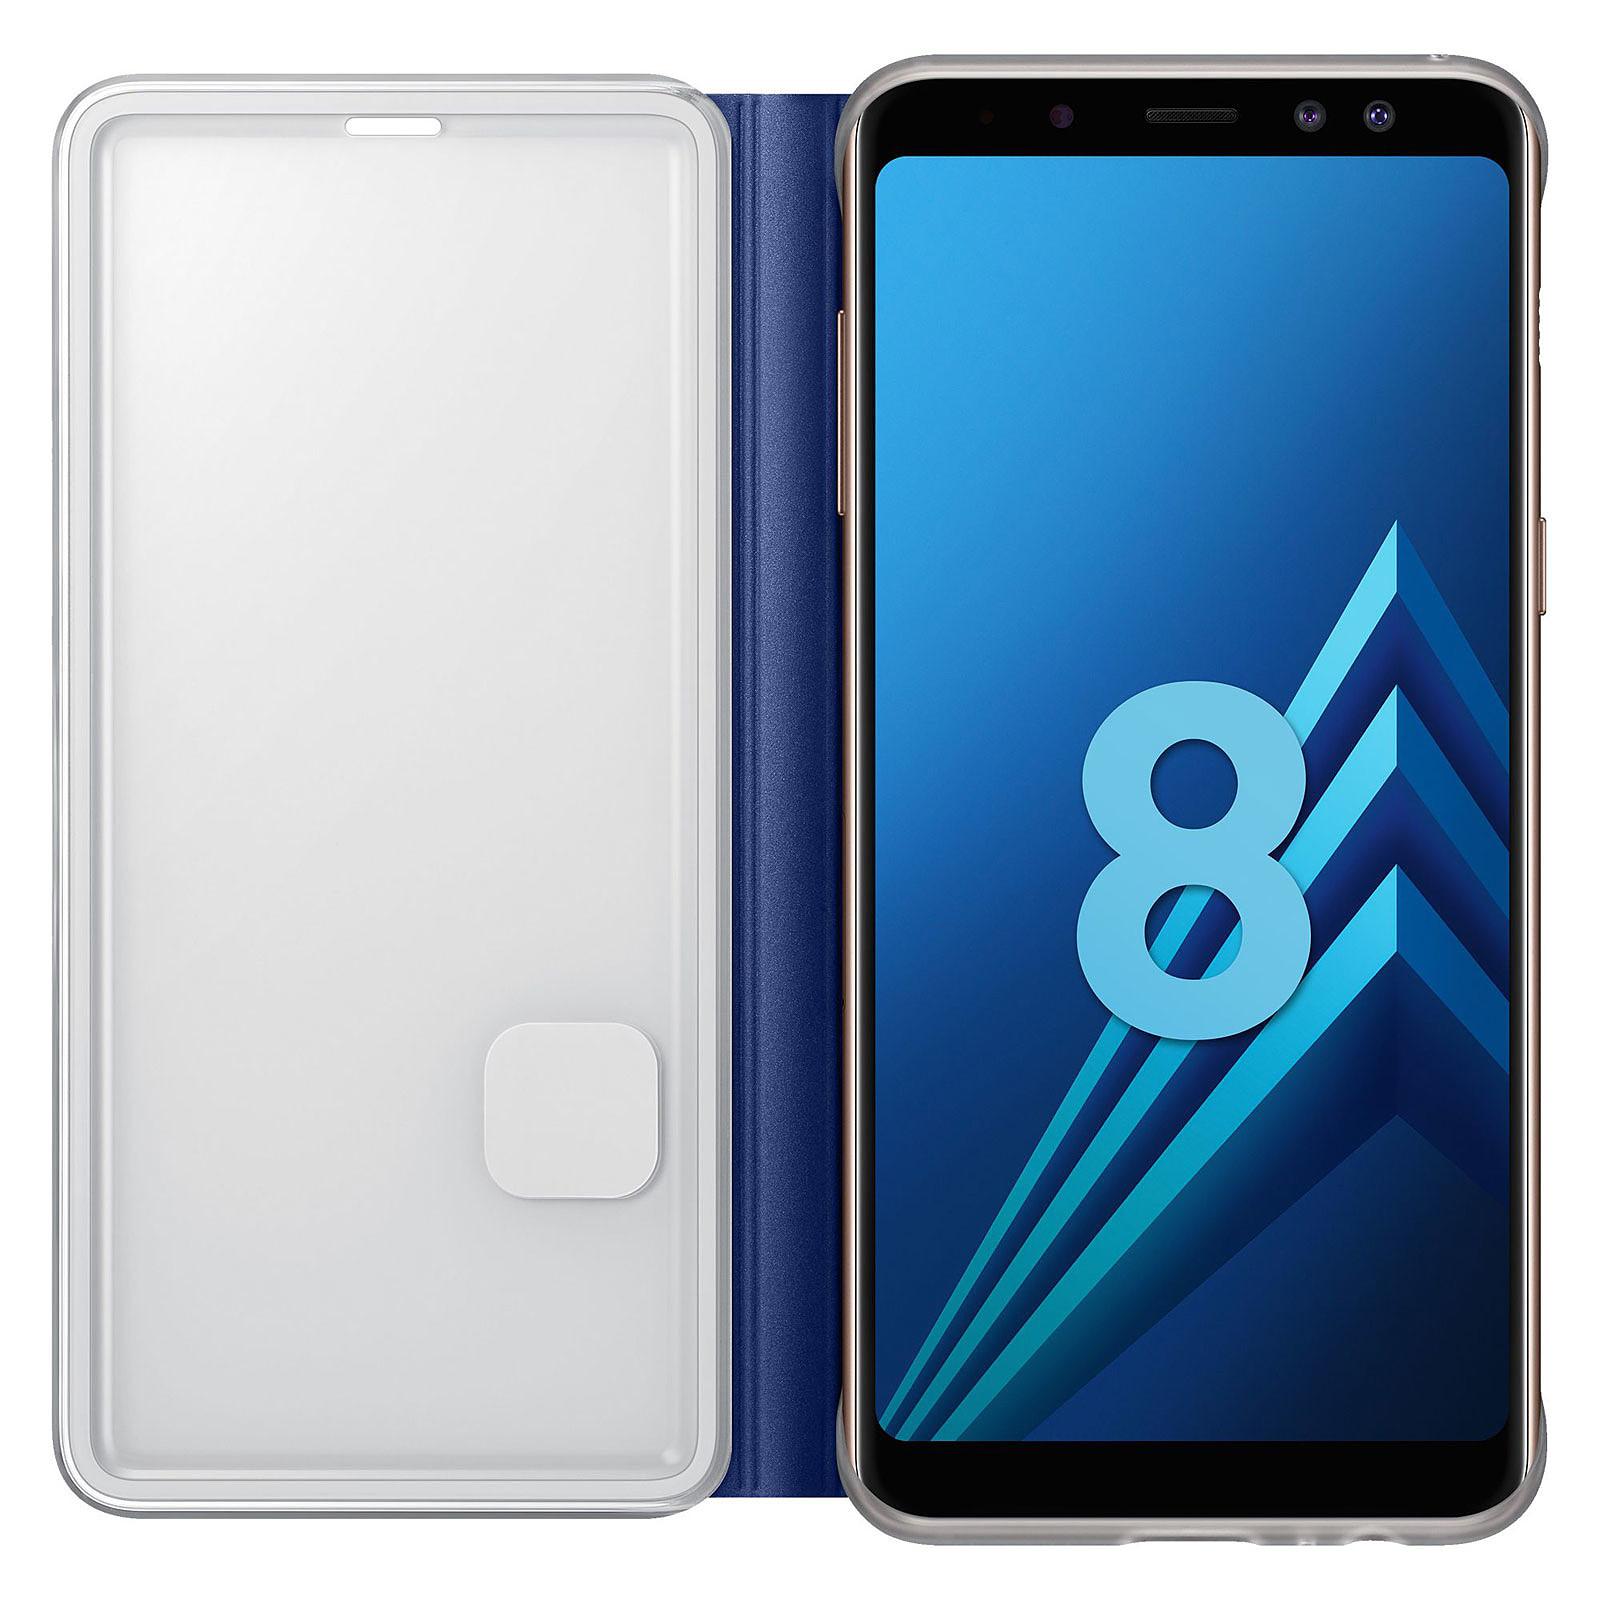 Samsung Flip Cover Néon Bleu Galaxy A8 - Coque téléphone Samsung ...